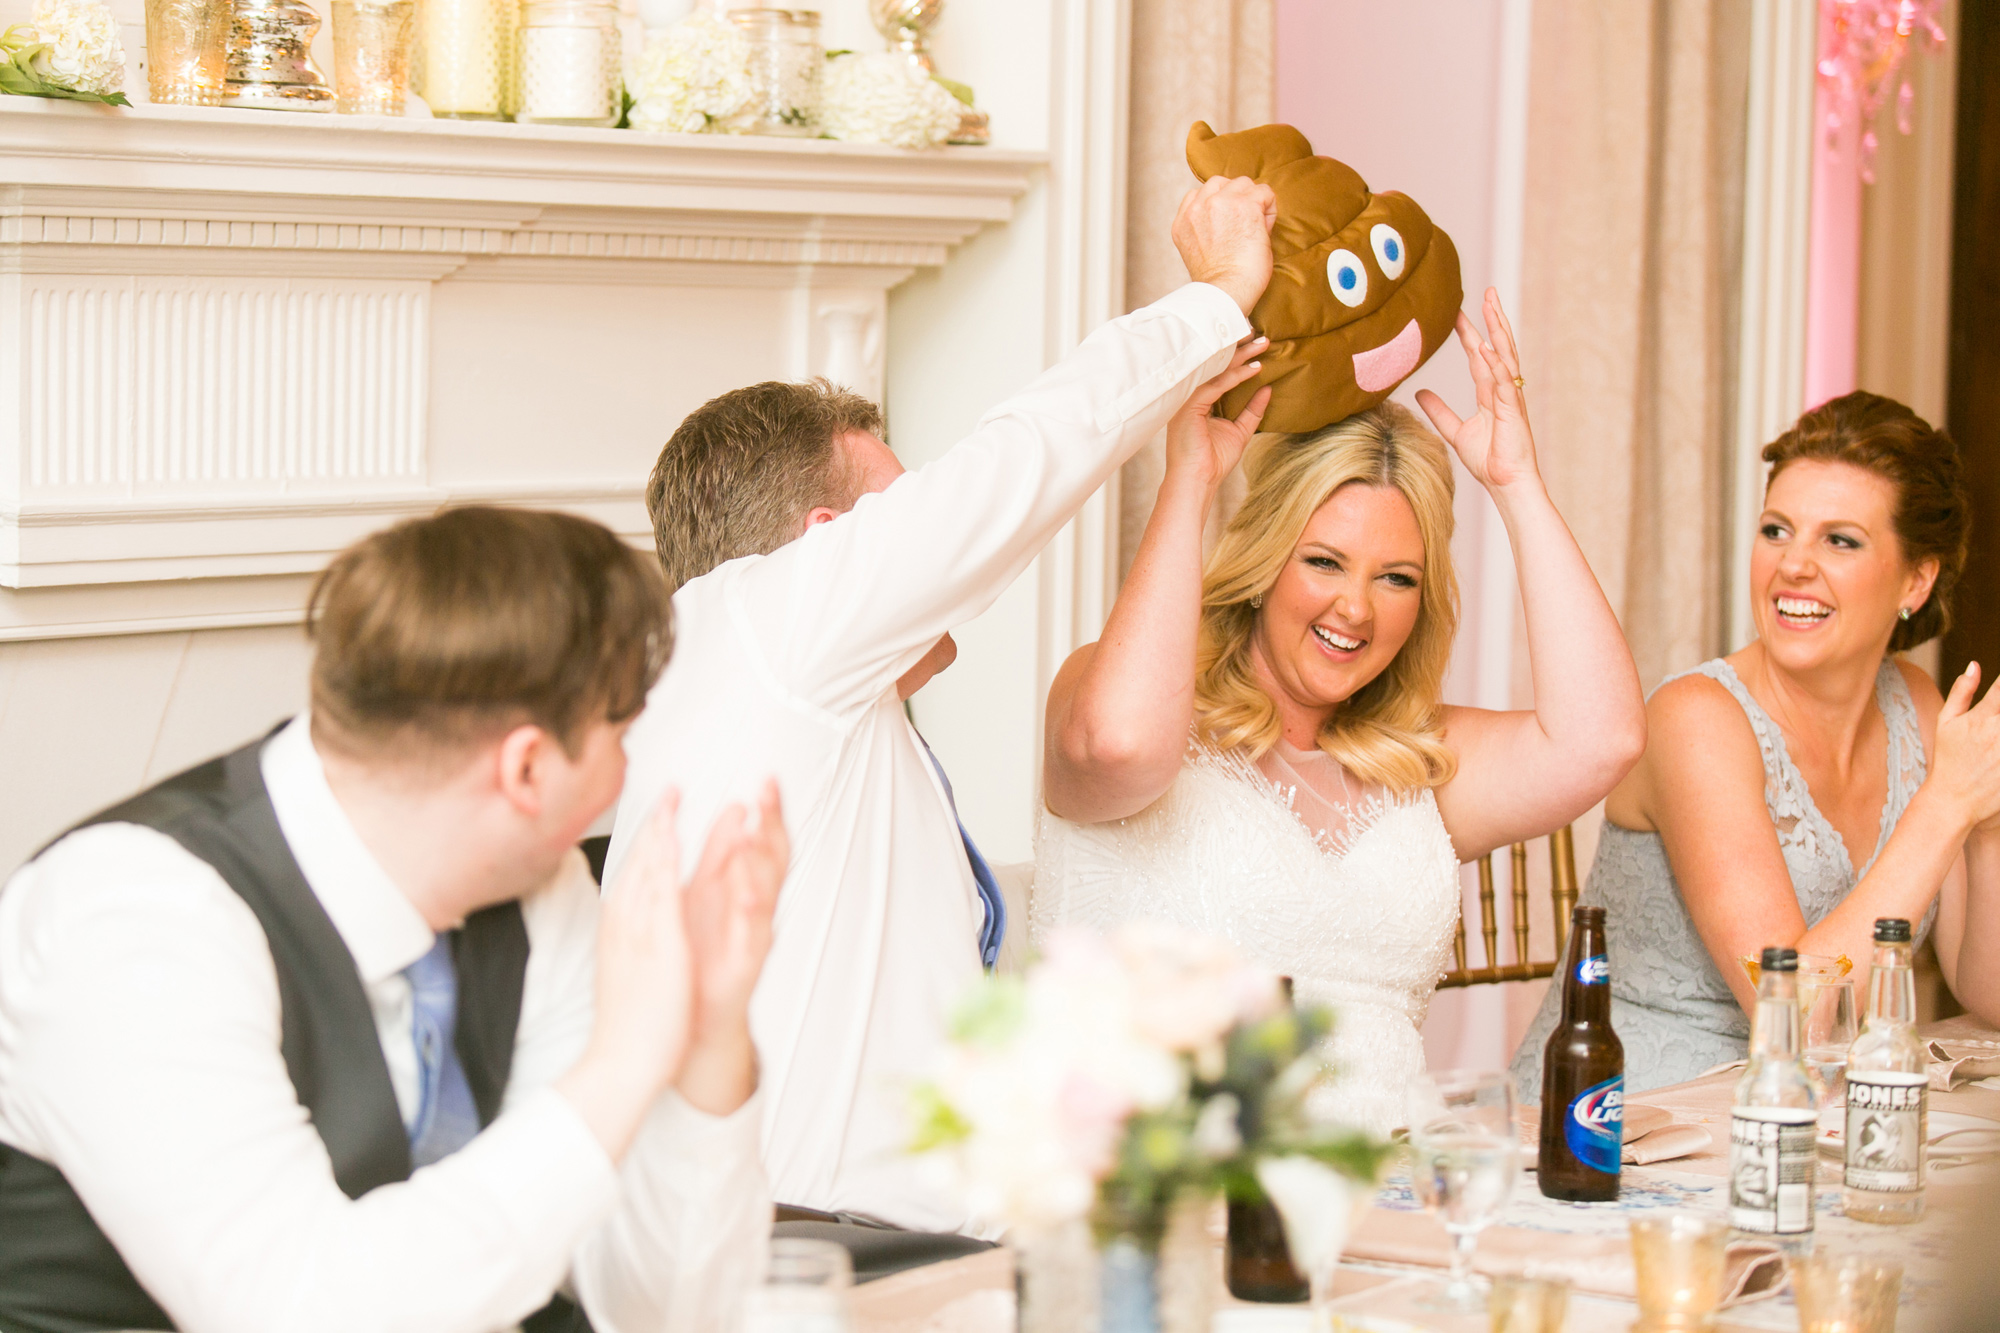 167-lord-nelson-wedding-------.jpg